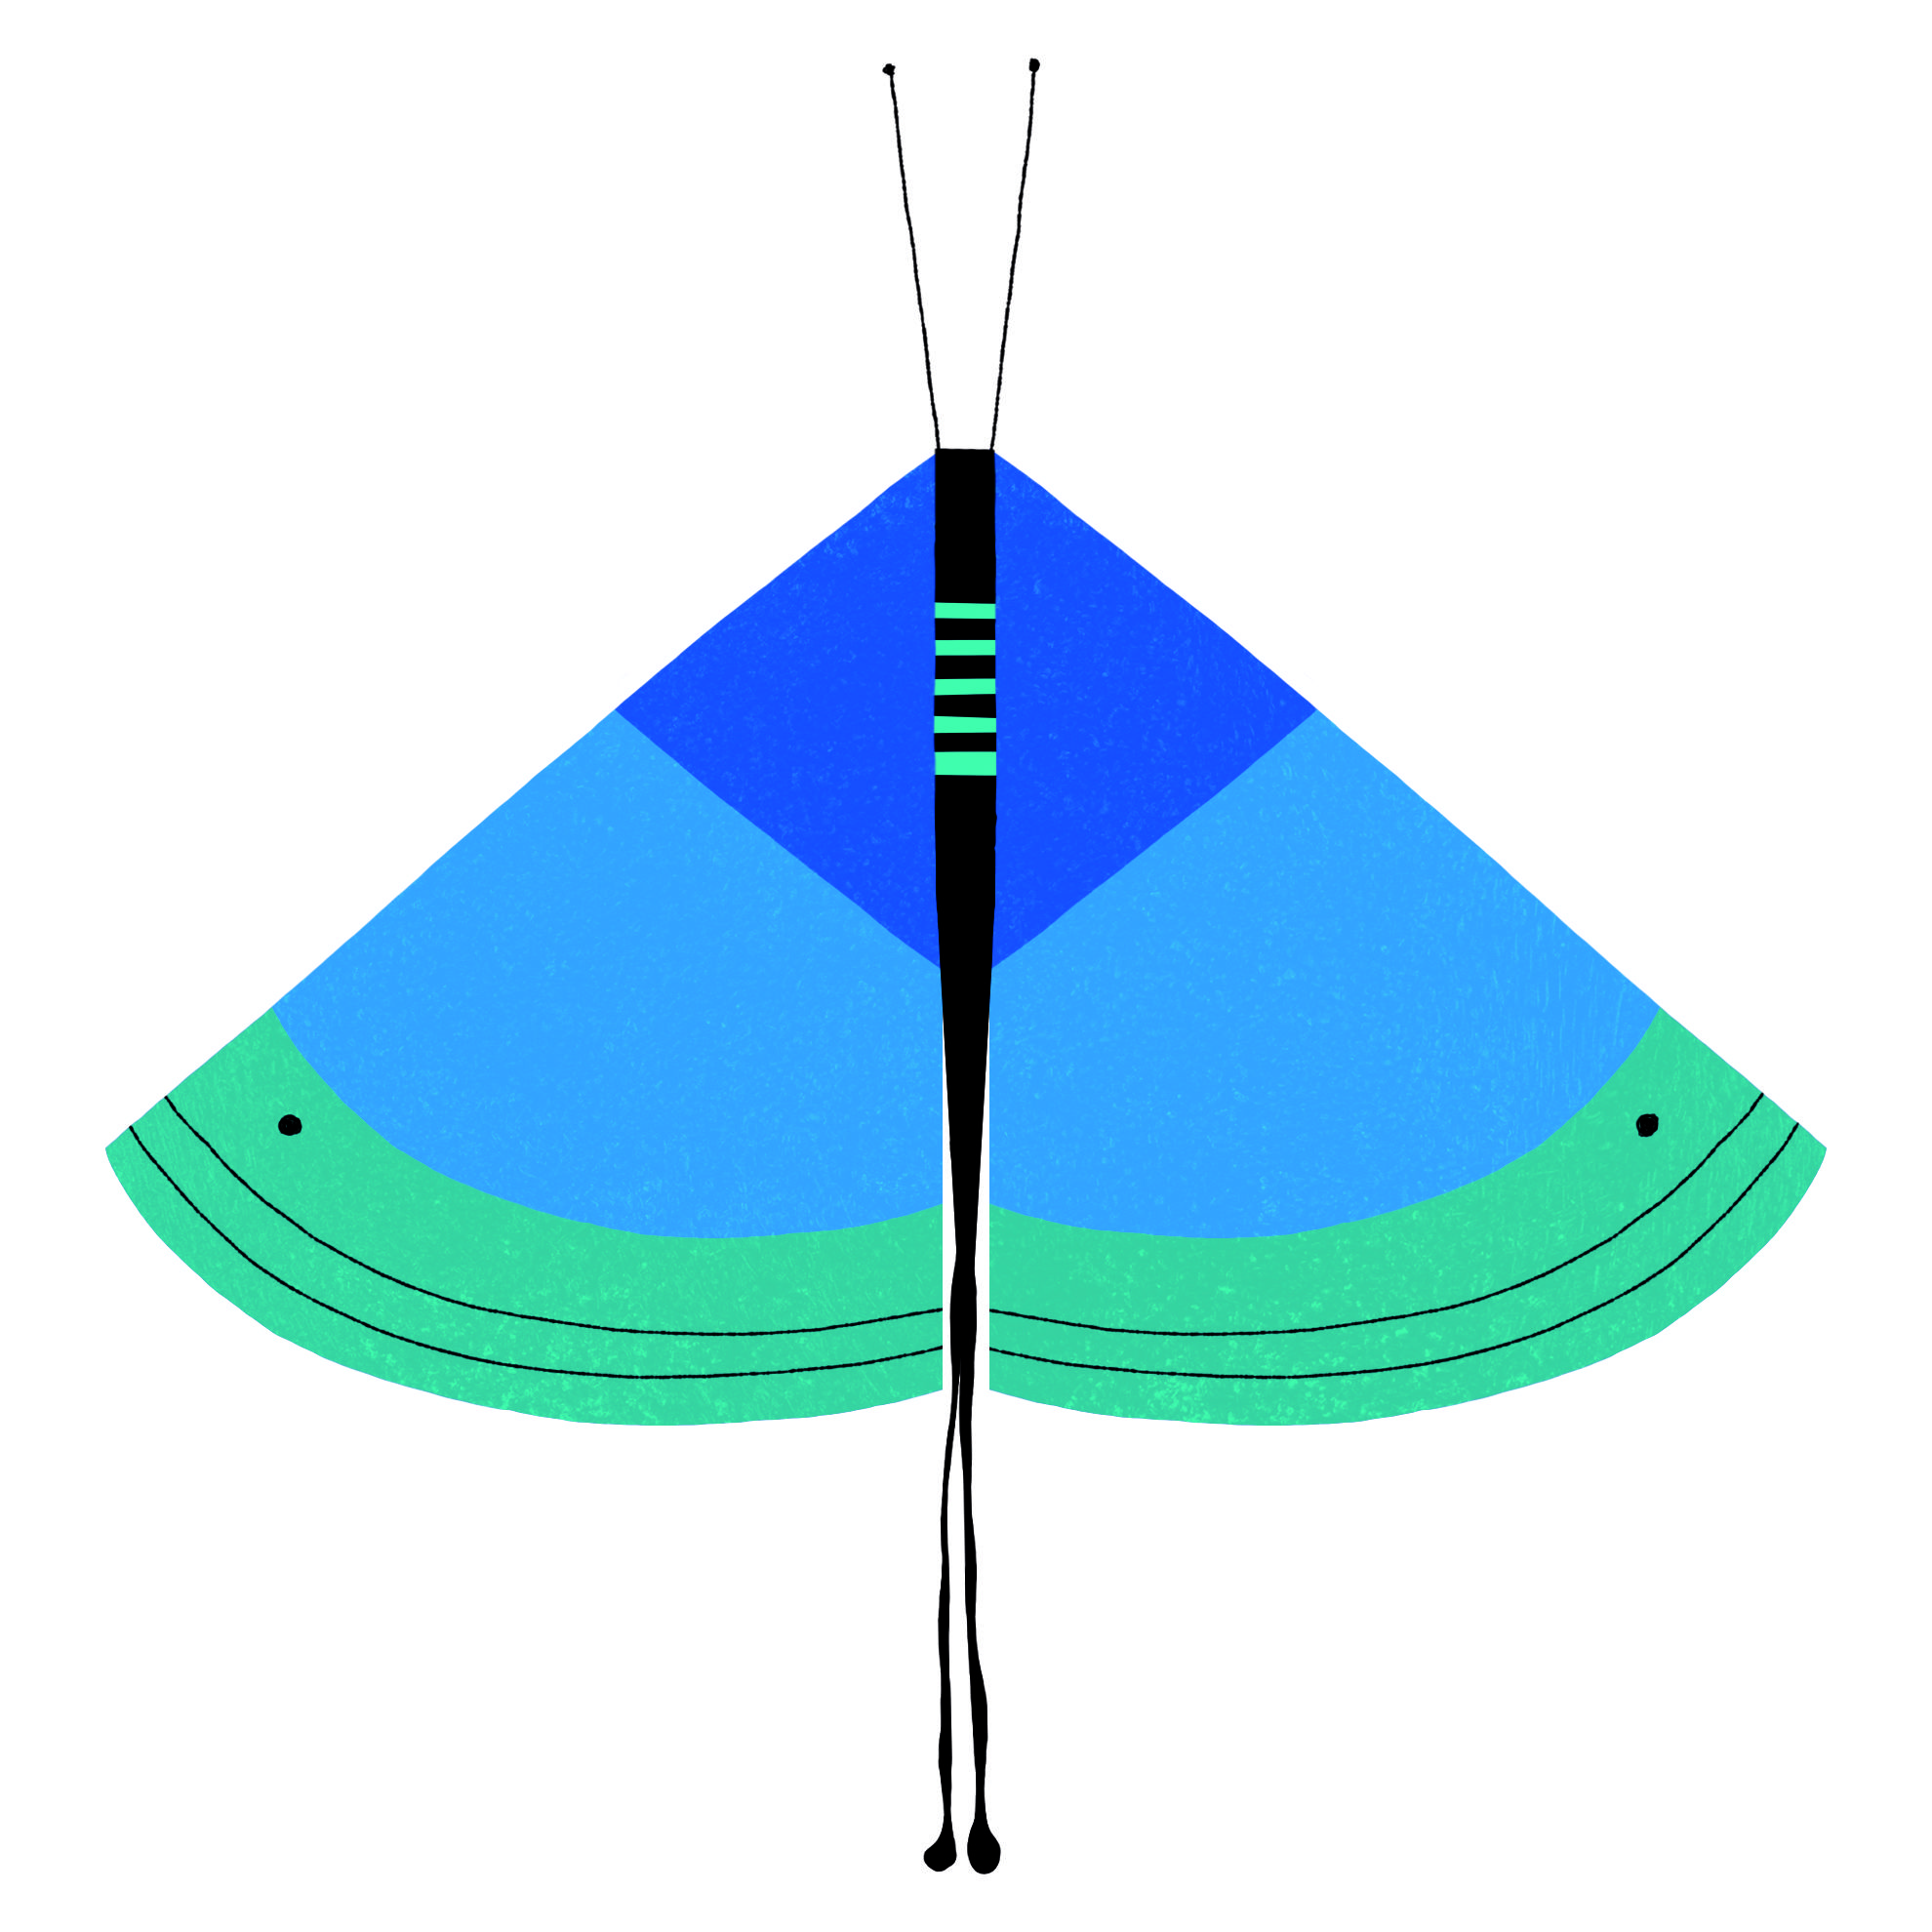 "JOIDART.COM ""Blue Lulu"" from THE PAINTINGFLIES by @mariadiamantes.  #joidart #barcelona #springtrends #silverjewelry #mariadiamantes #thepaintingflies #blue #butterflies #kidsjewellery #jewellery #fashion #style #jewellerymakers #onlineshop #jewelleryonlineshop #comingsoon"